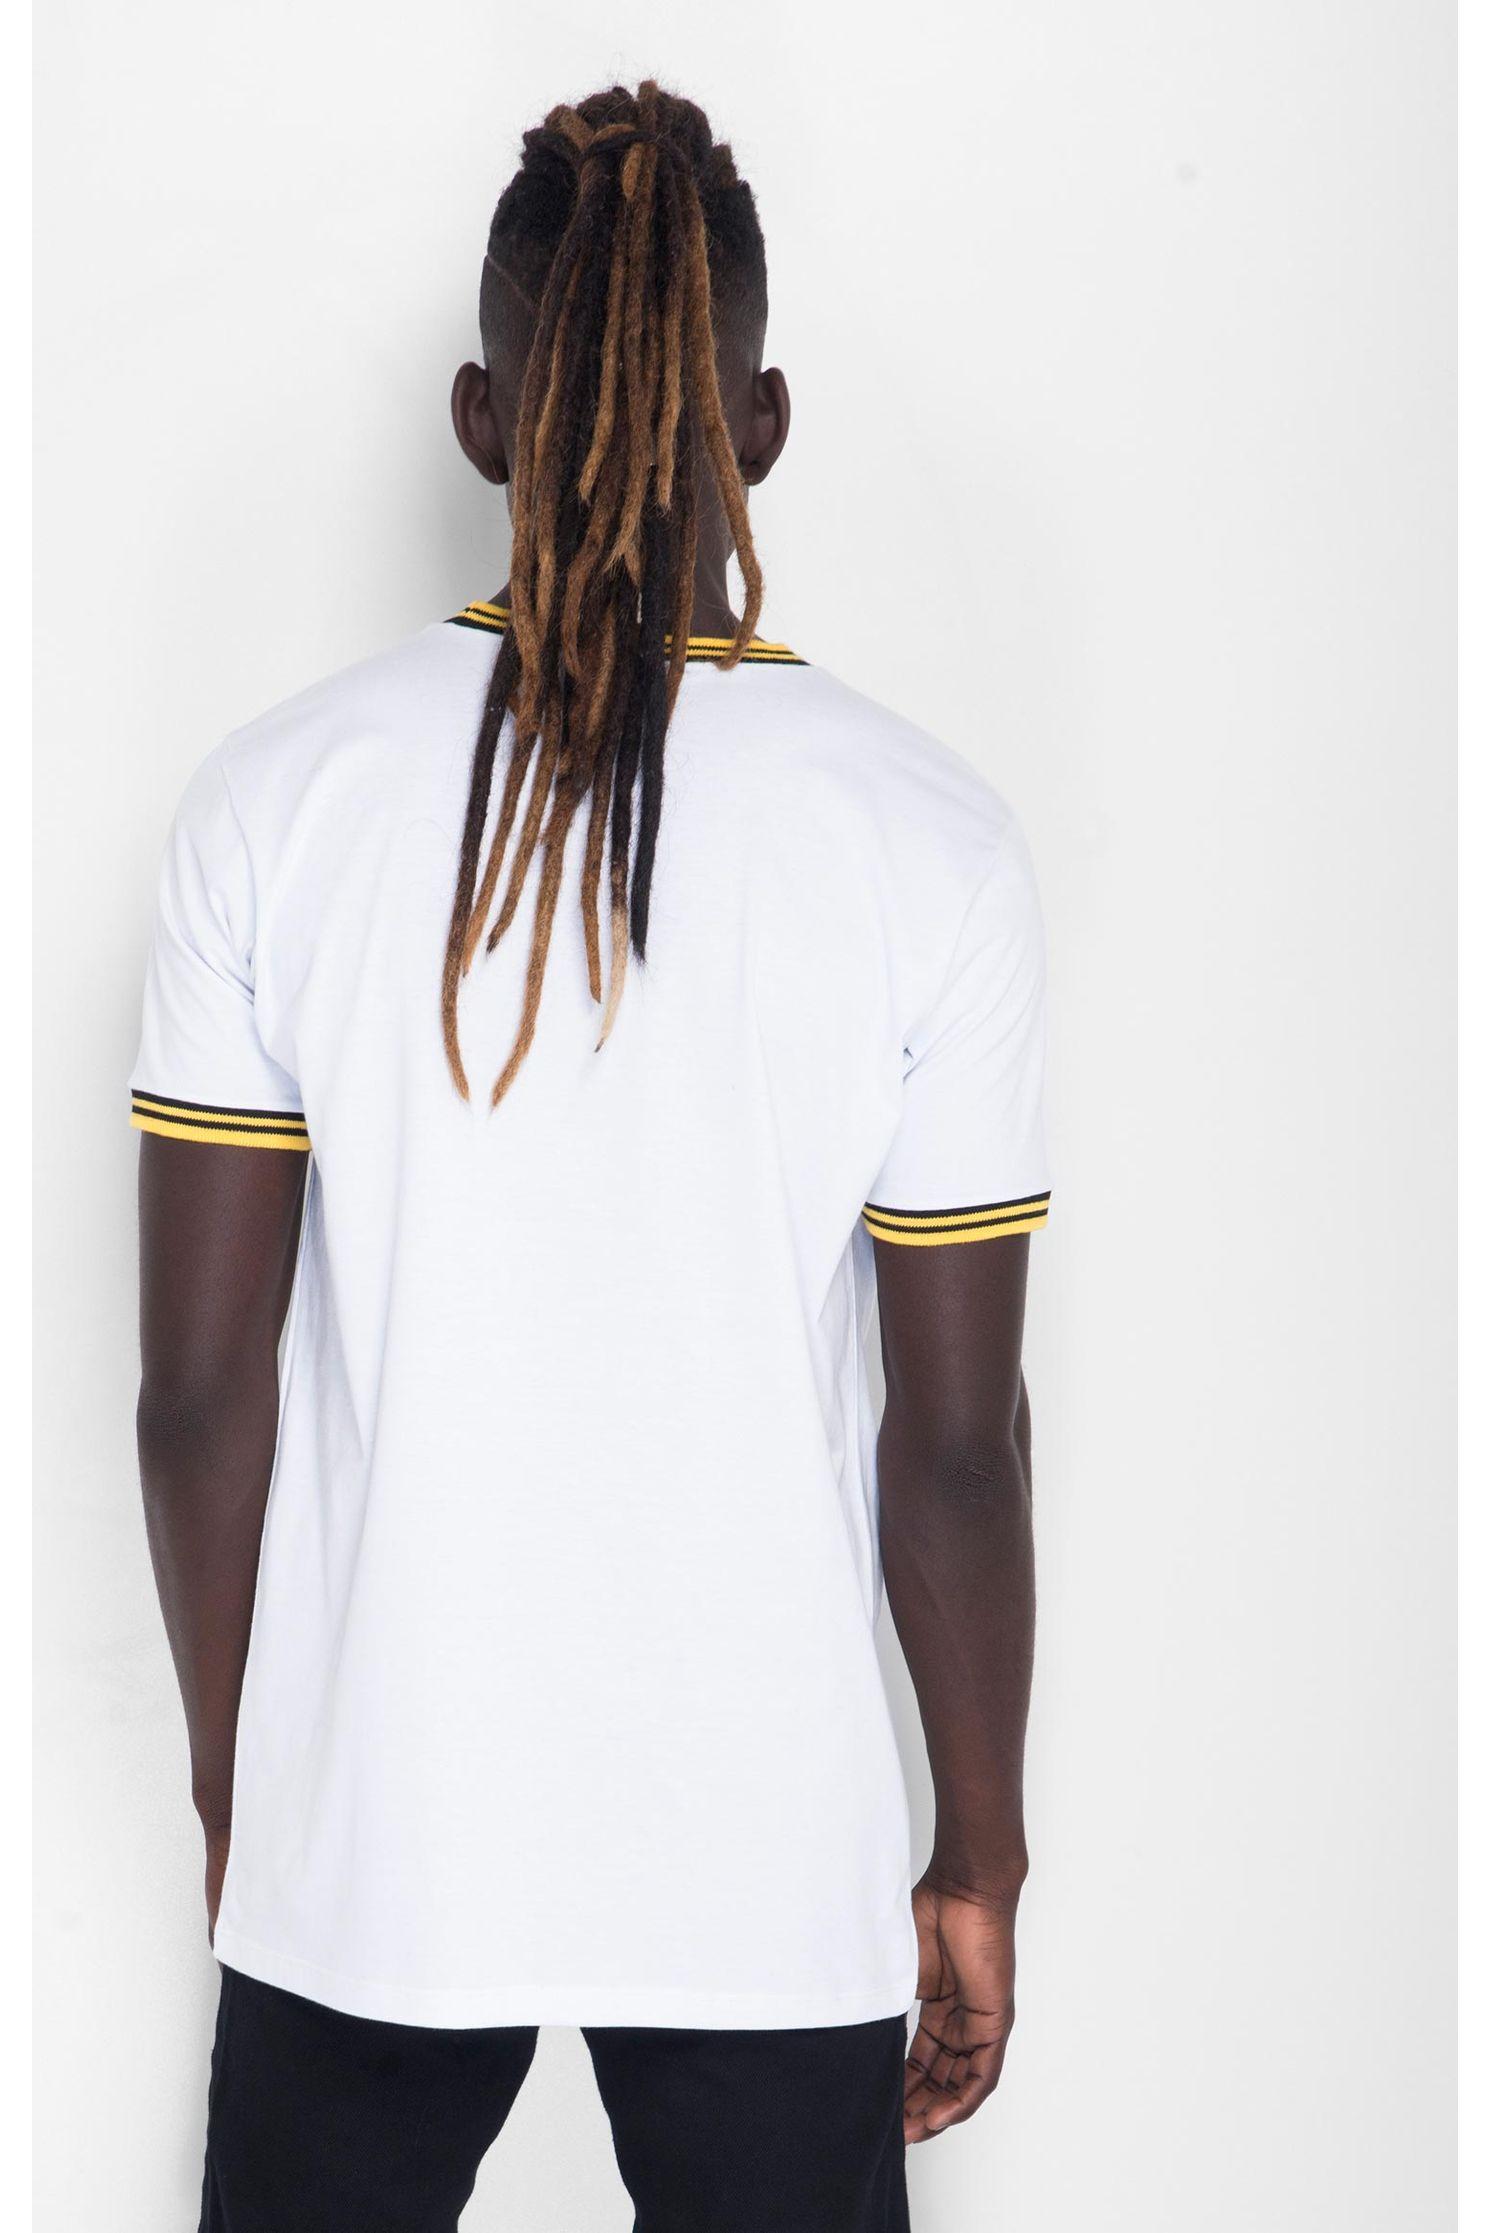 Camiseta College Tiger - bawclothing b7958ec250c19